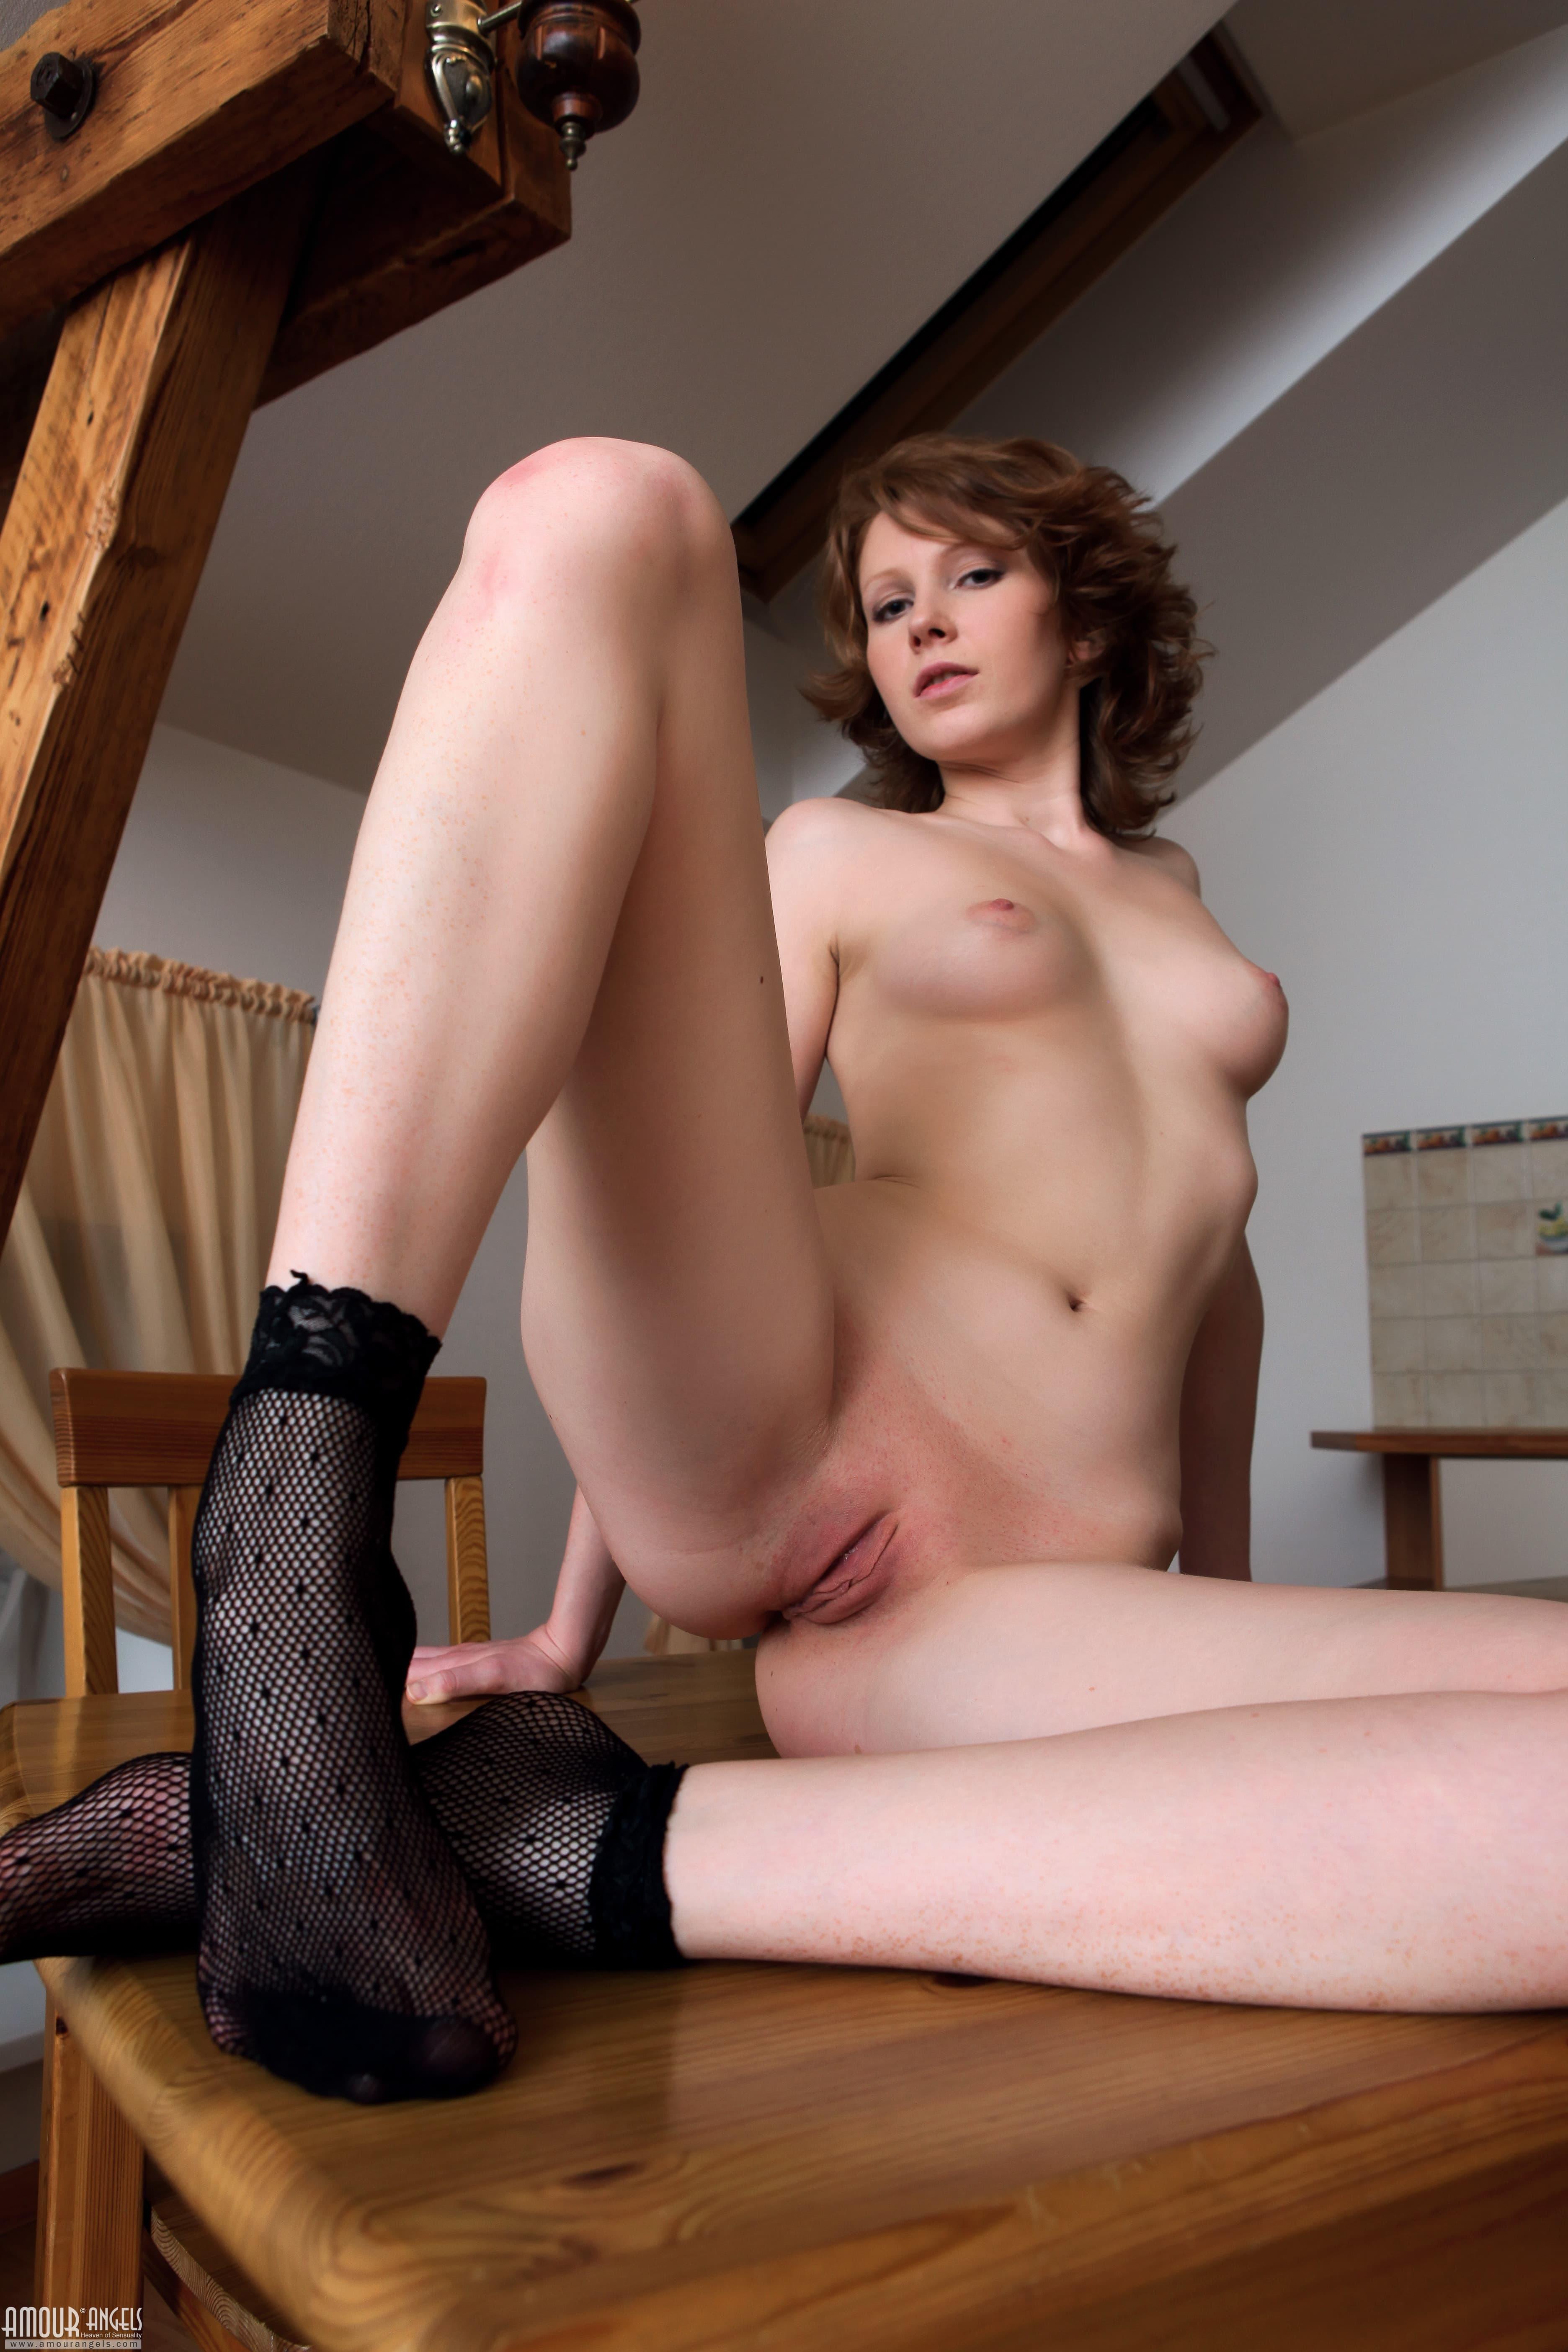 socks-fetish-nude-girls-pussies-mix-vol5-54